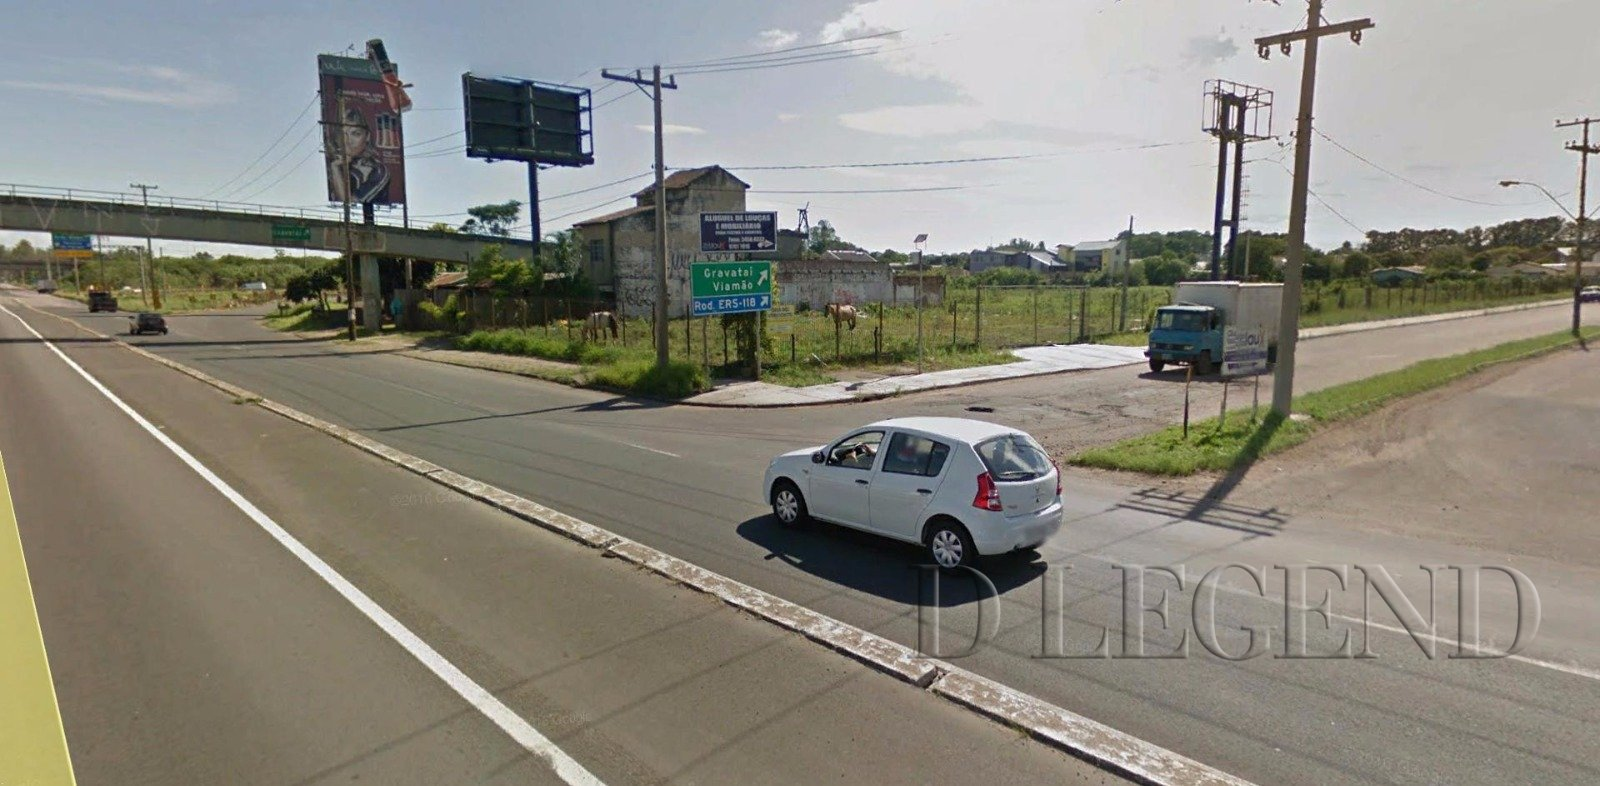 AMPLO TERRENO DE FRENTE PARA BR 116 - Avenida Luiz Pasteur, 820 - Tres Portos - Sapucaia do Sul